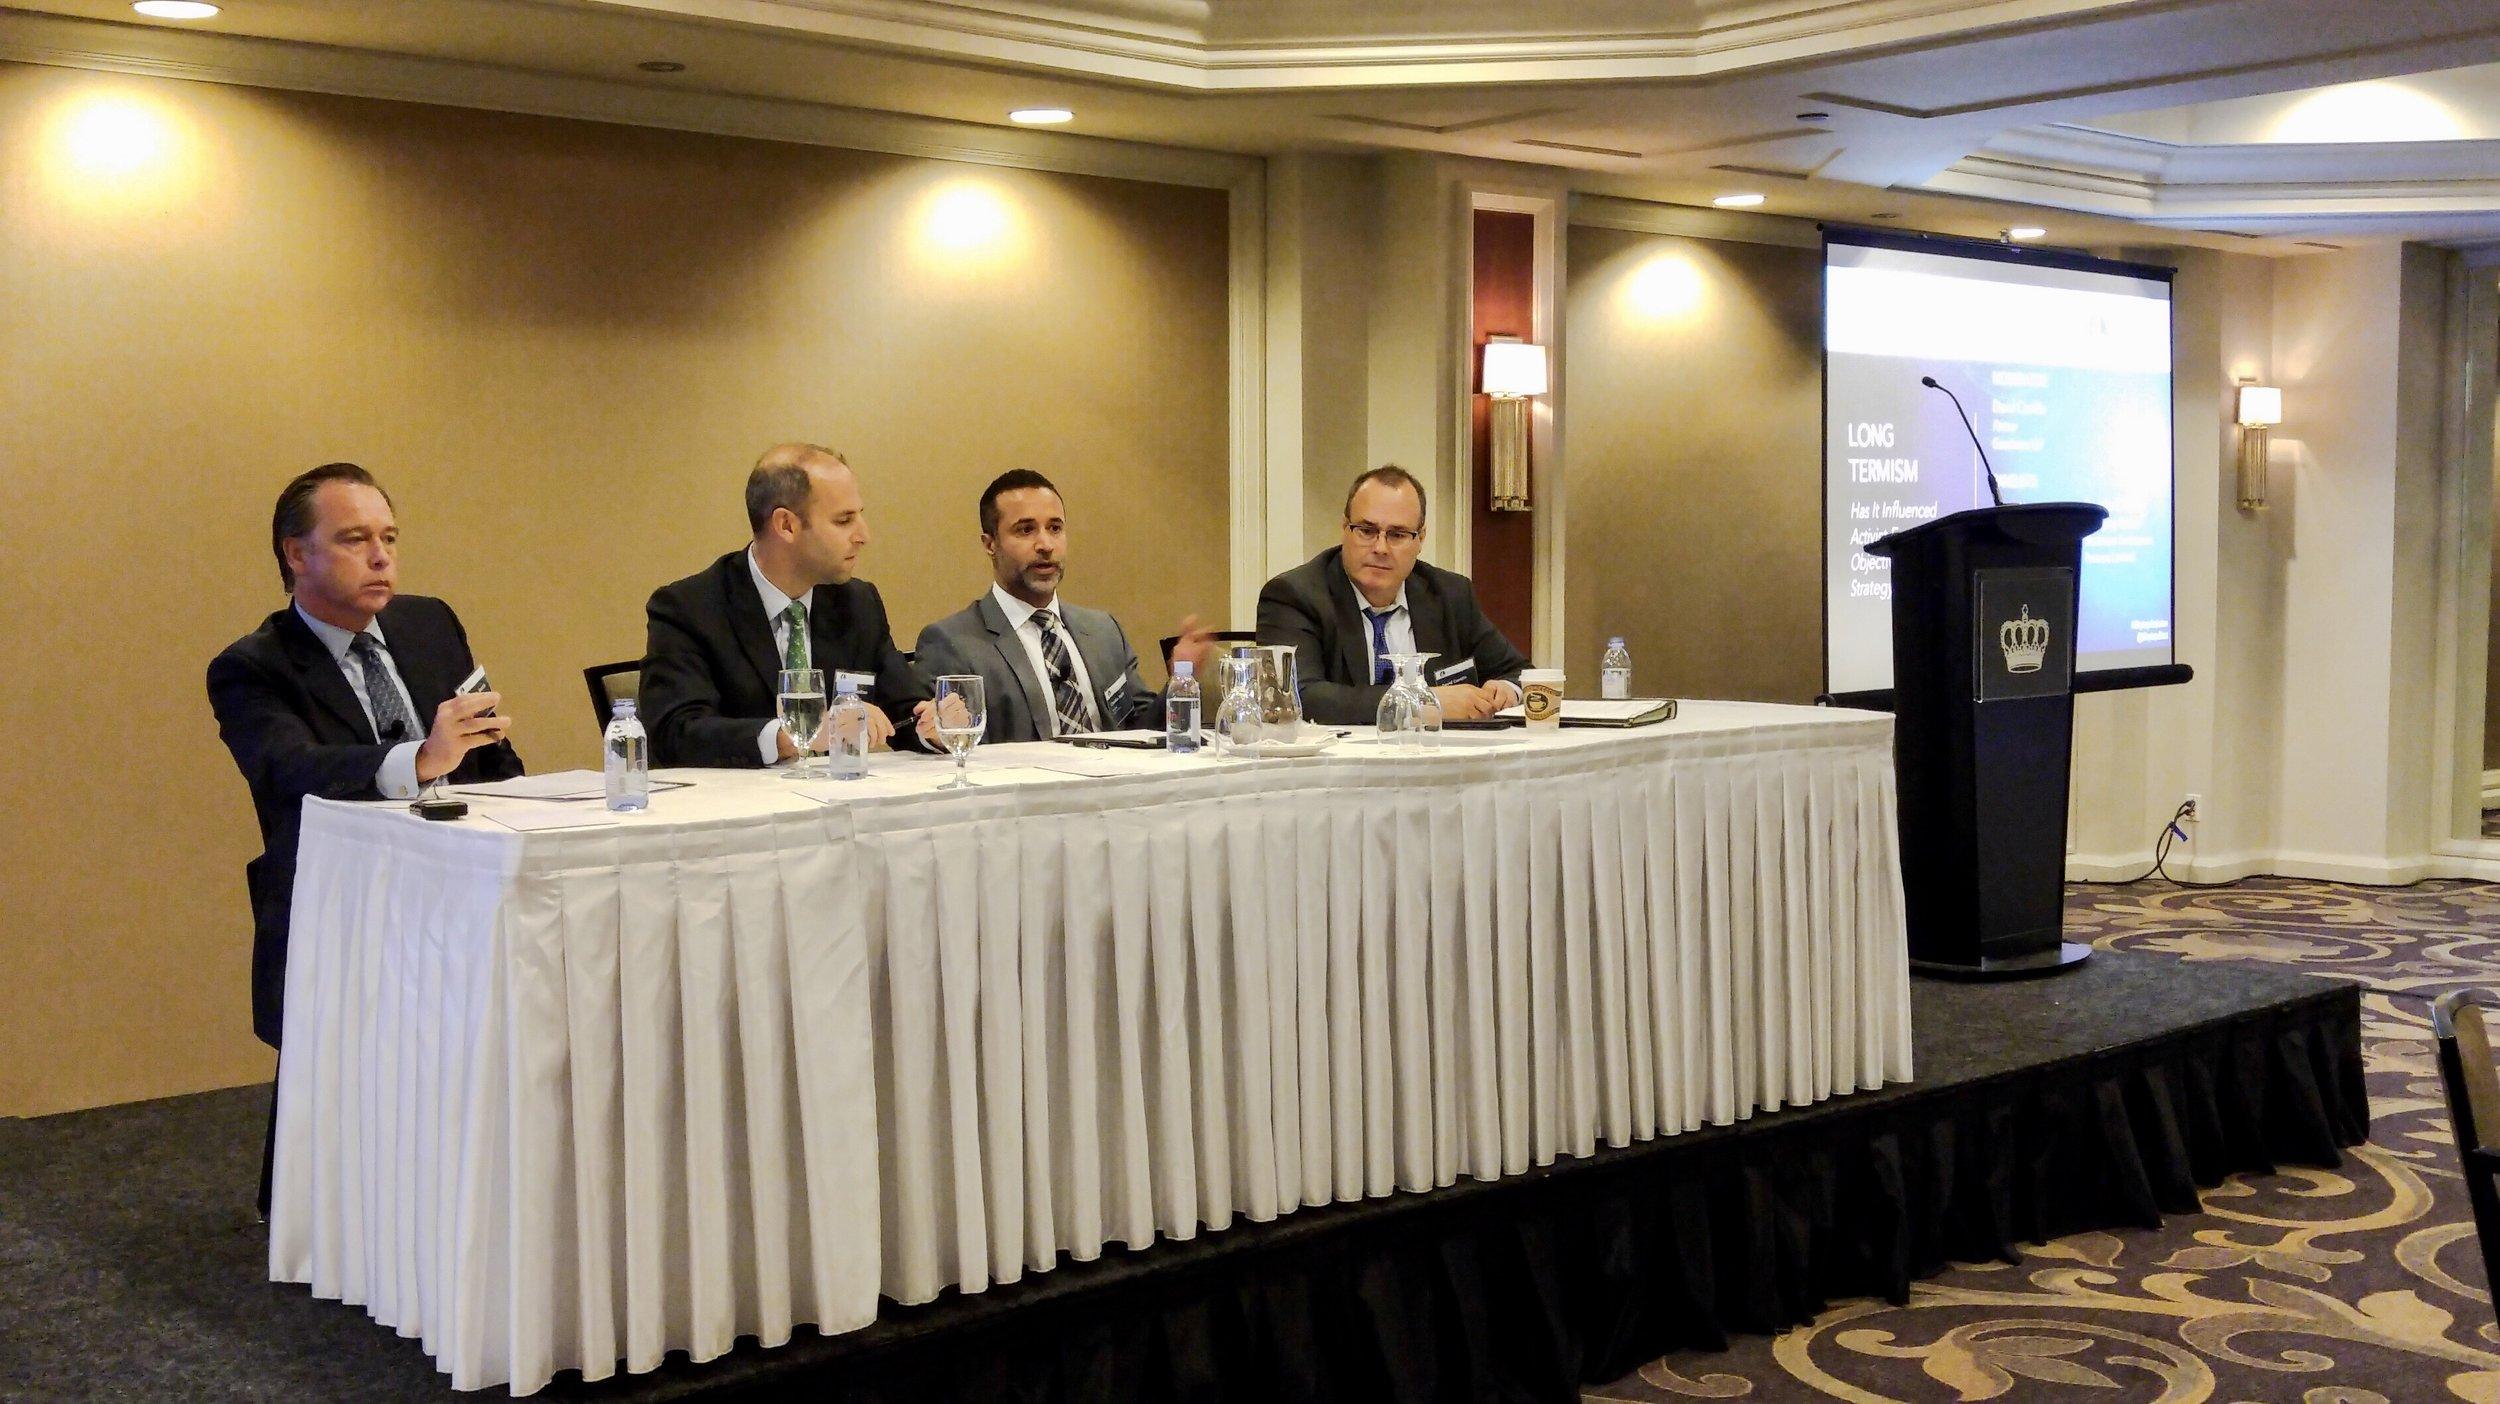 Claudio Rojas - Hurt Capital - Long Termism – Global Shareholder Engagement and Activism Summit